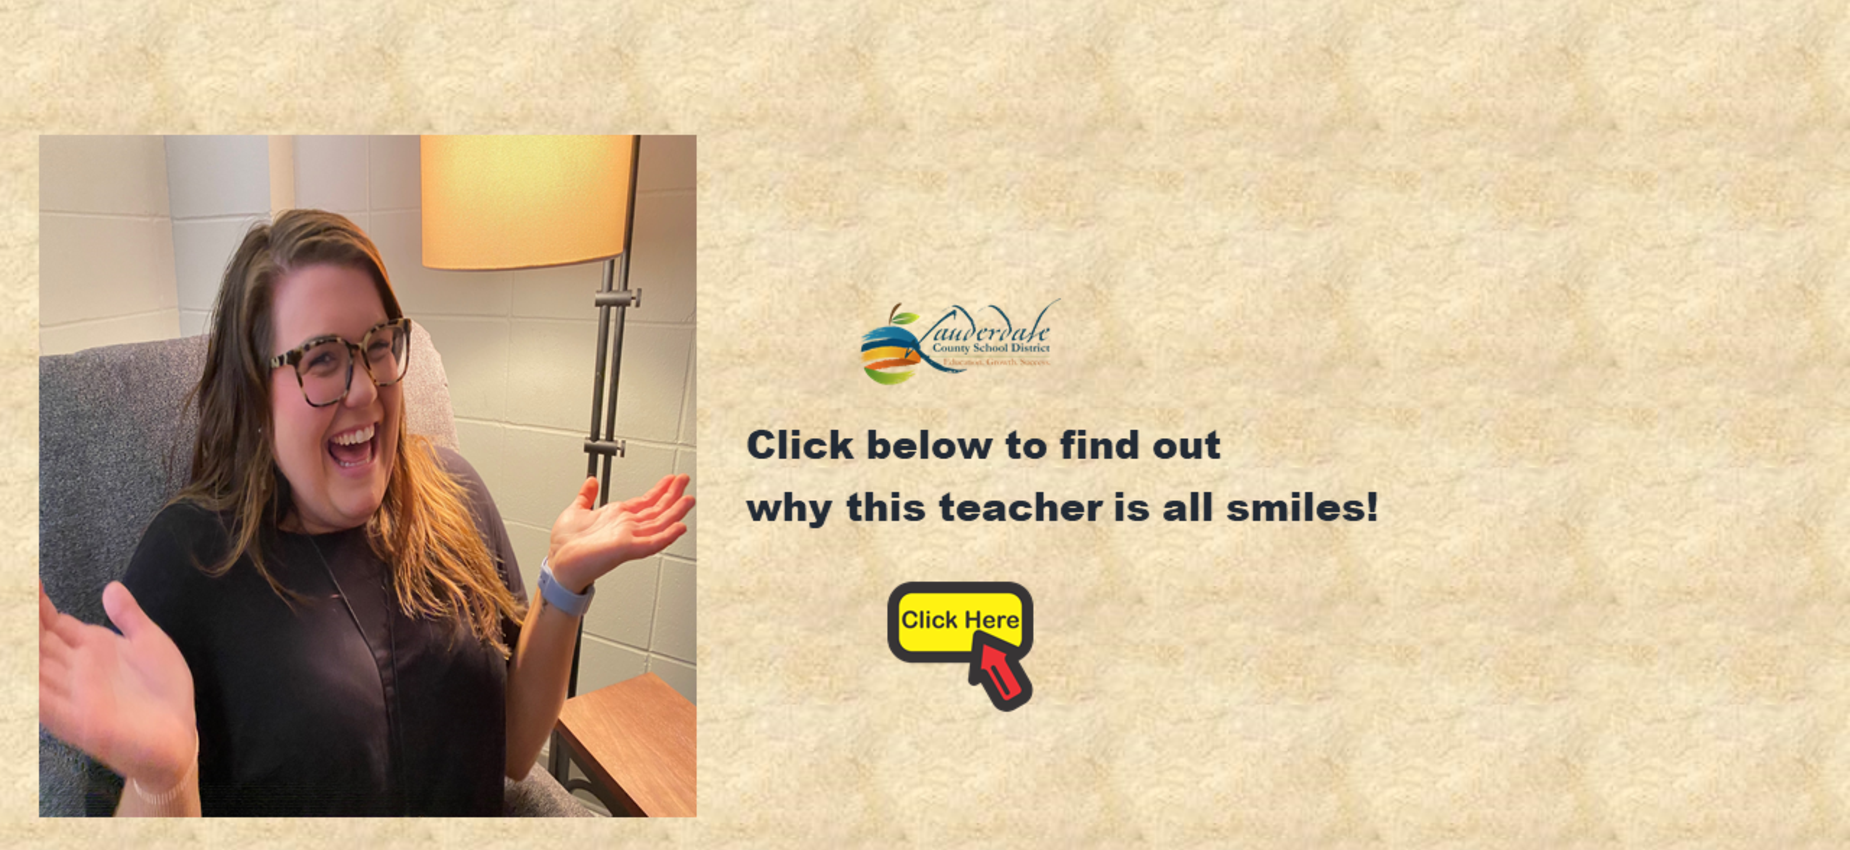 LCSD Decompression Room Teacher's Reaction Photo